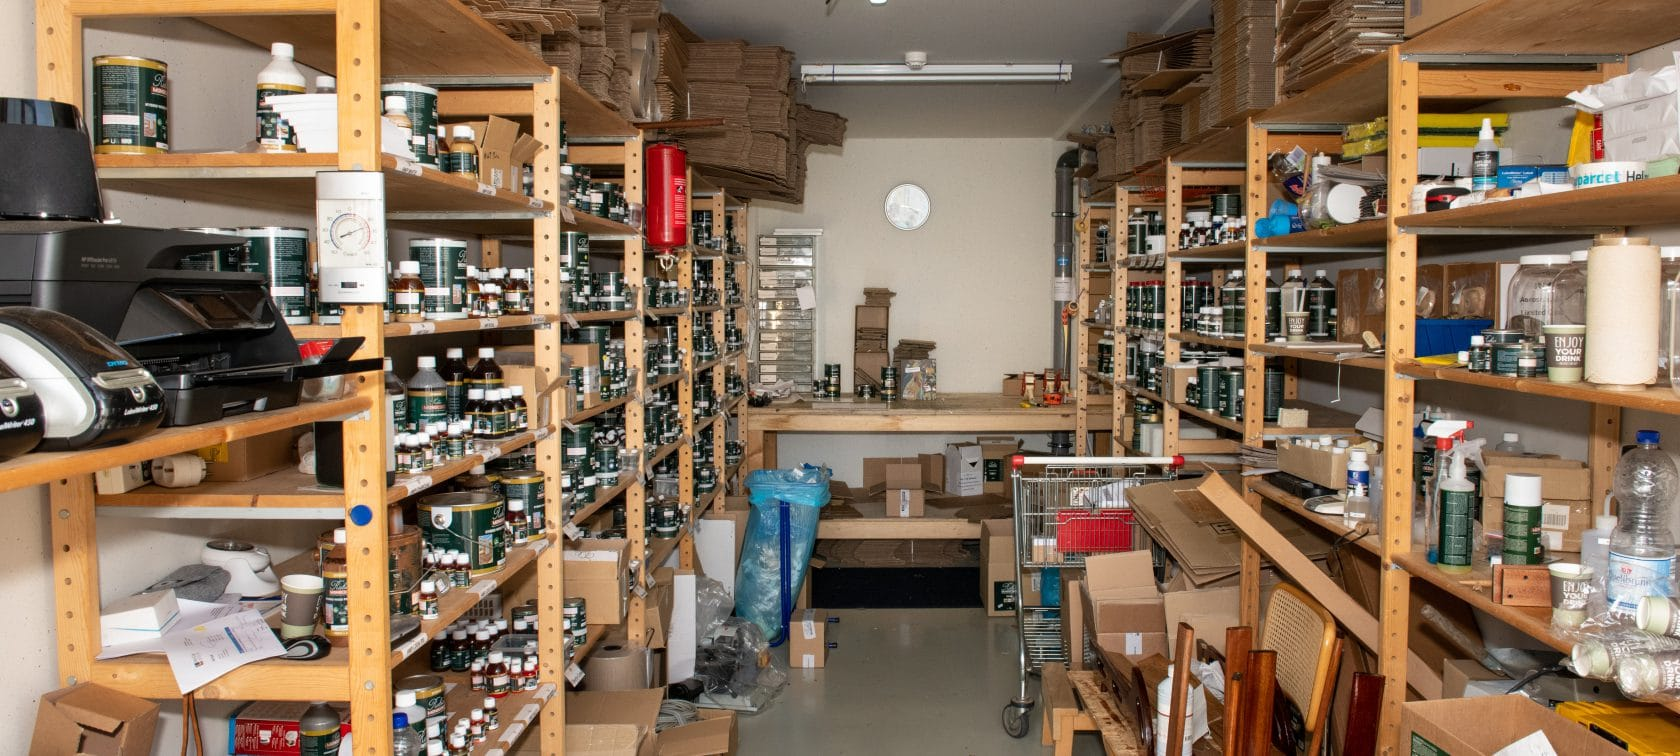 Magazijn webshop - opslagruimte garagebox - GaragePark